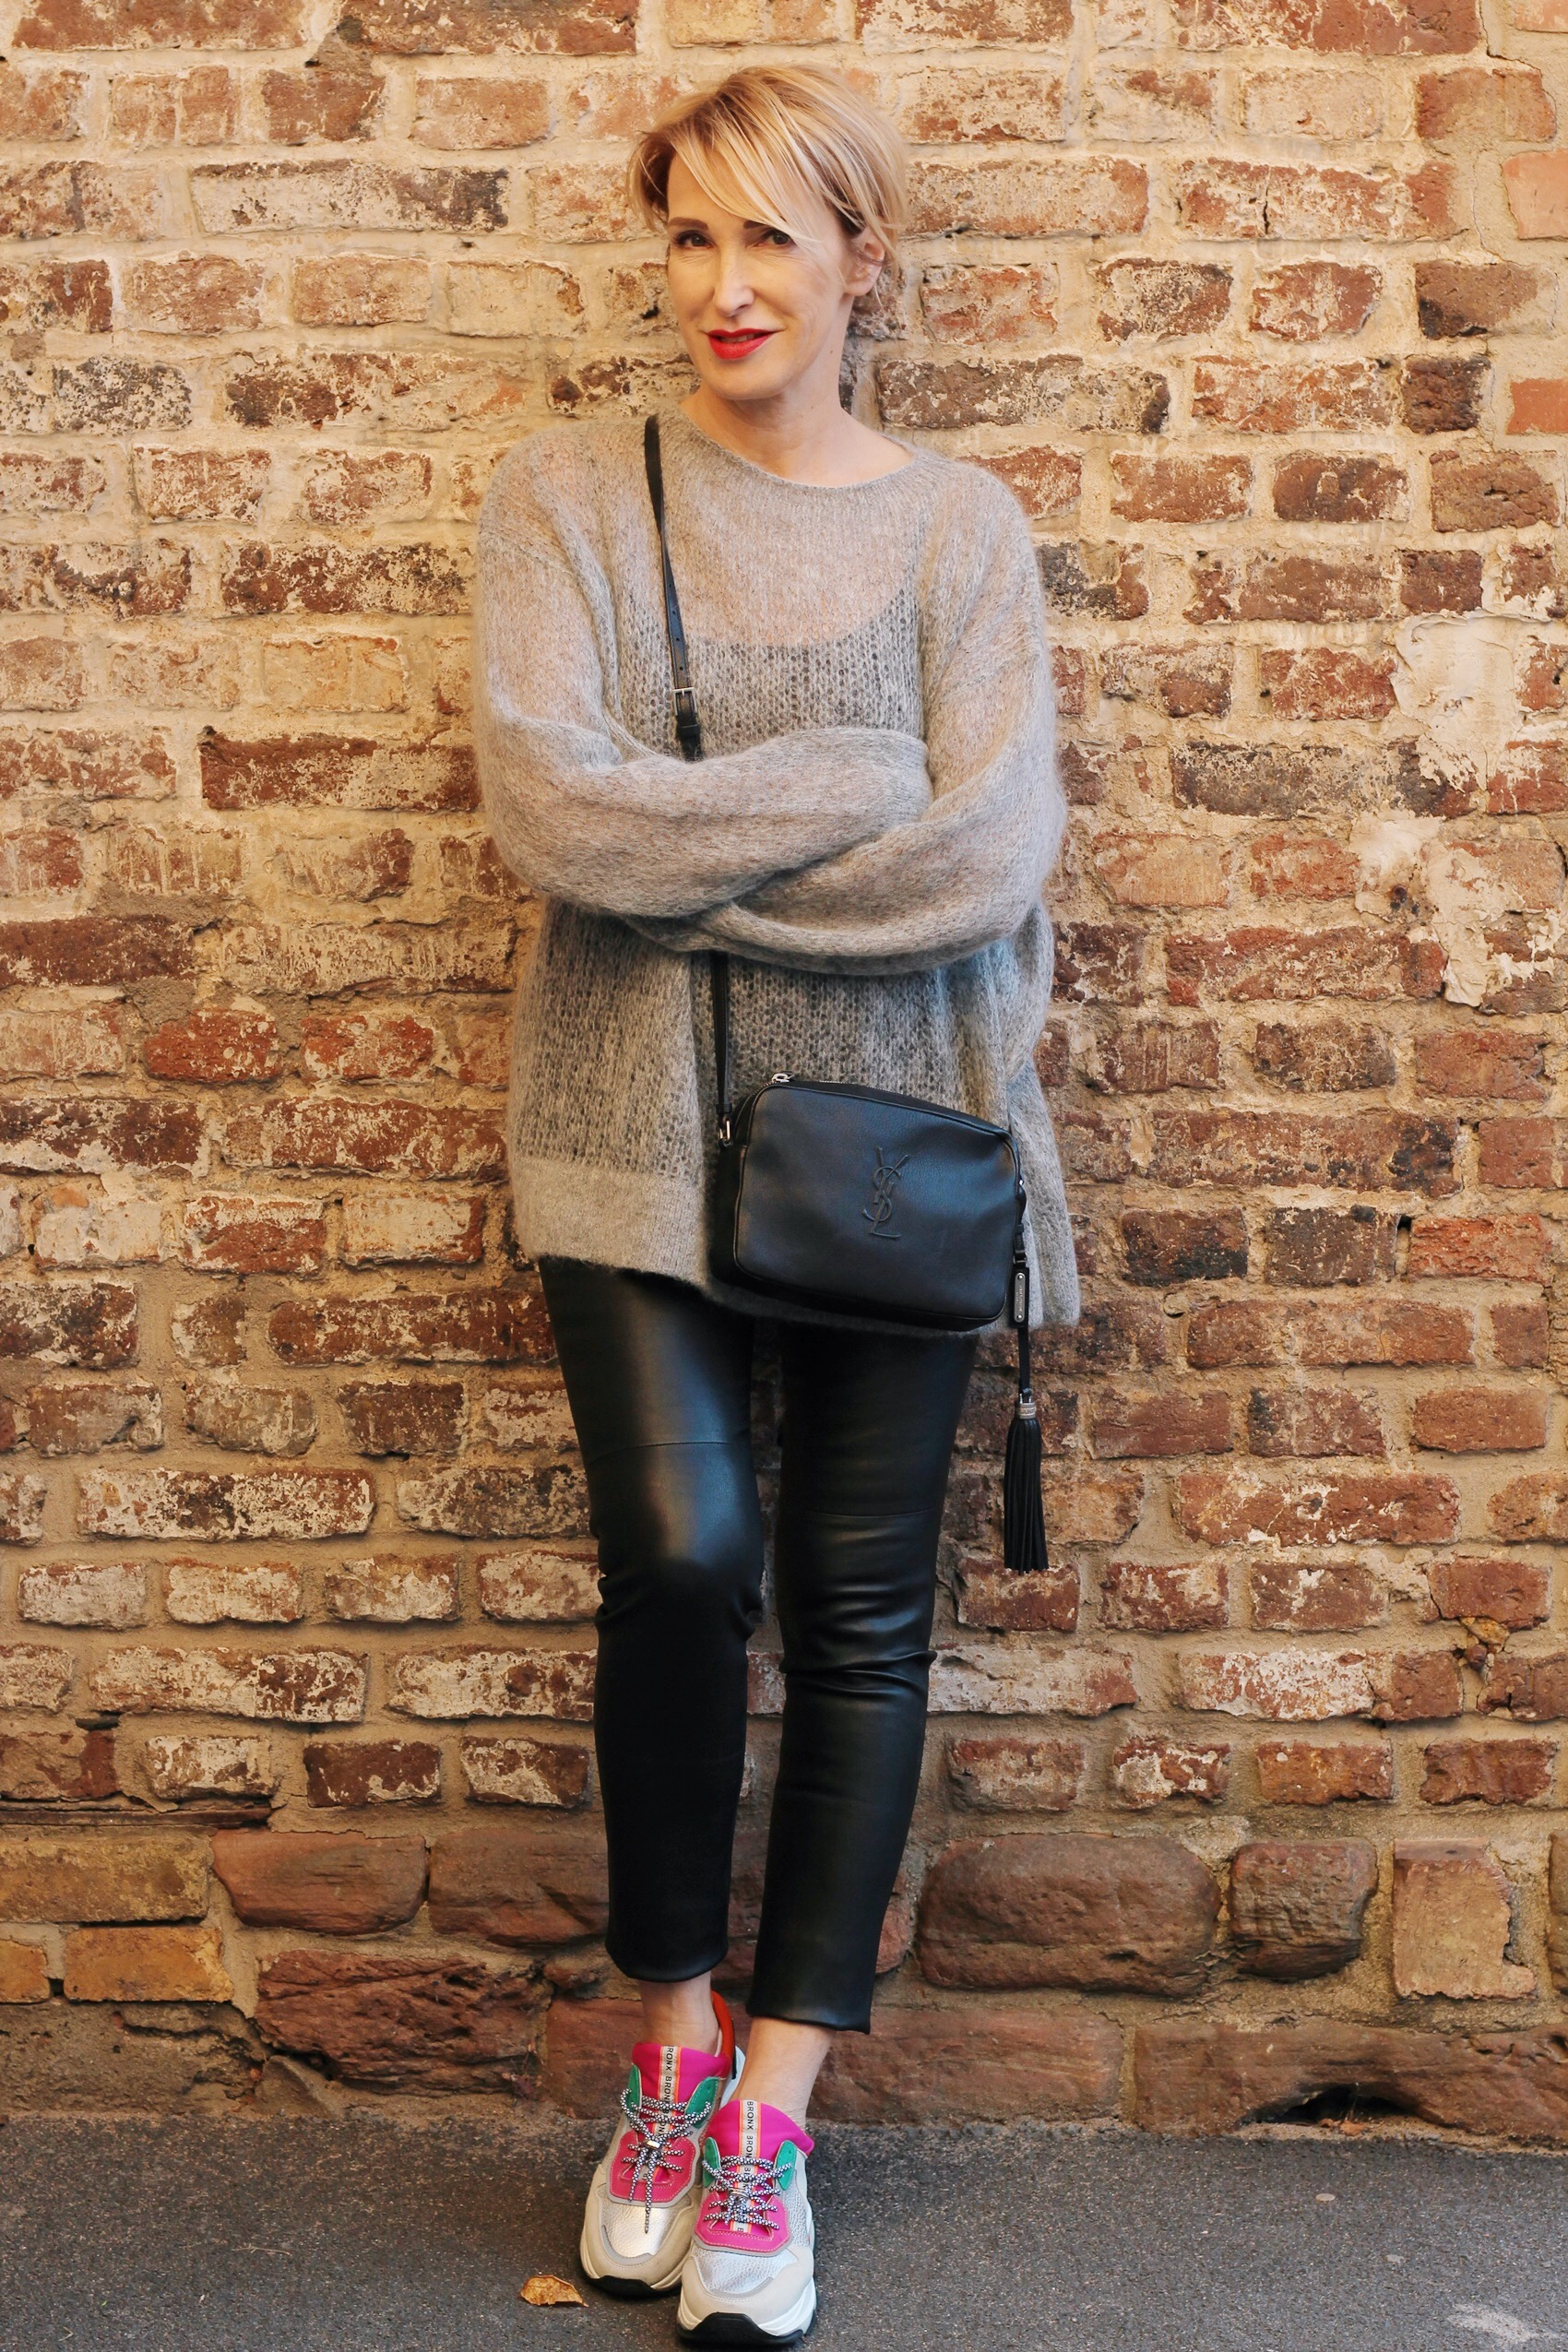 glamupyourlifestyle lederleggings lederhosen sneakers Winter-Outfits ue-40-blog ue-50-blog ü-40-blog ü-50-blog